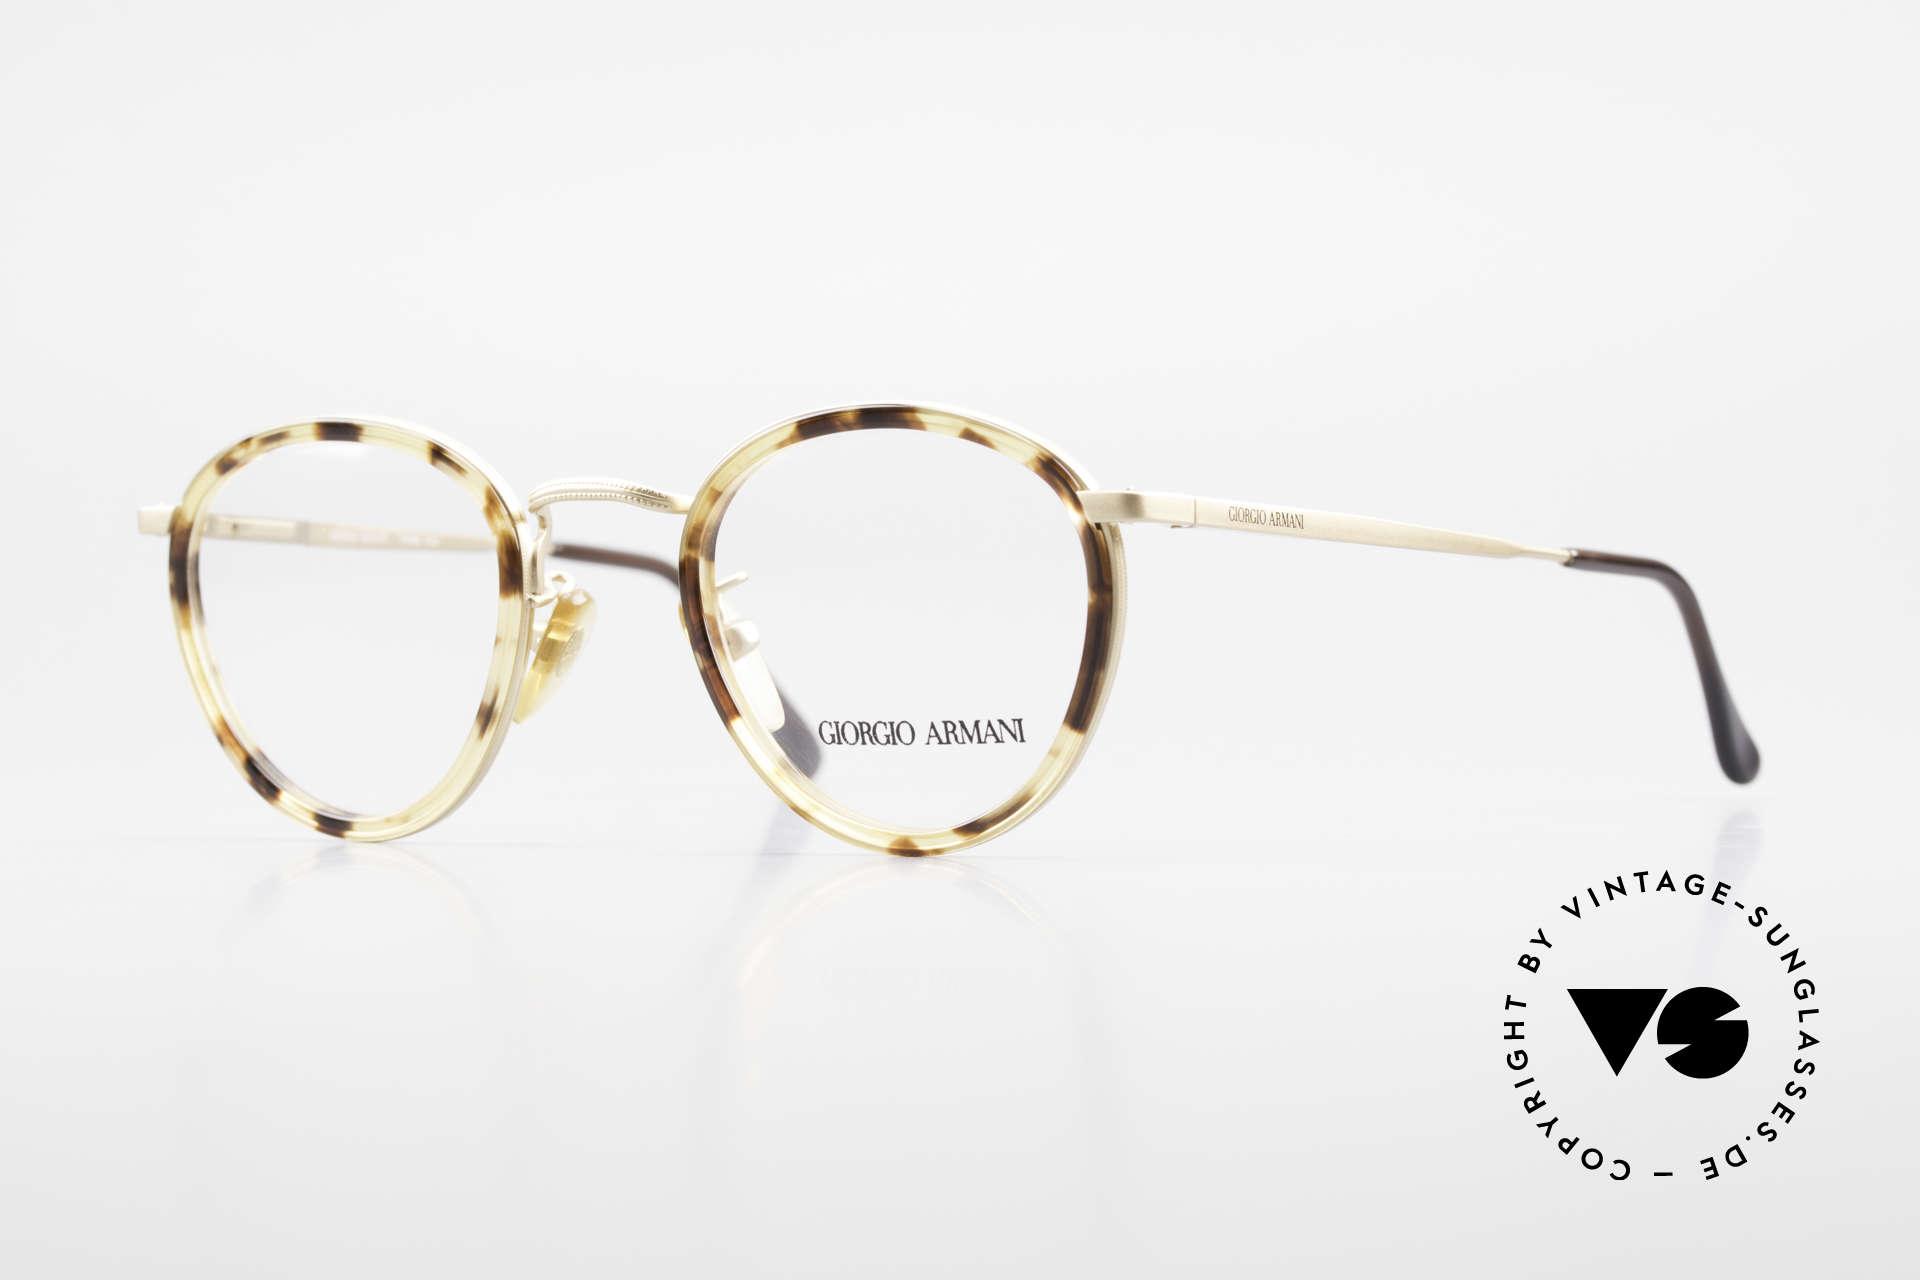 Giorgio Armani 159 Panto Glasses Windsor Rings, timeless vintage Giorgio Armani designer eyeglasses, Made for Men